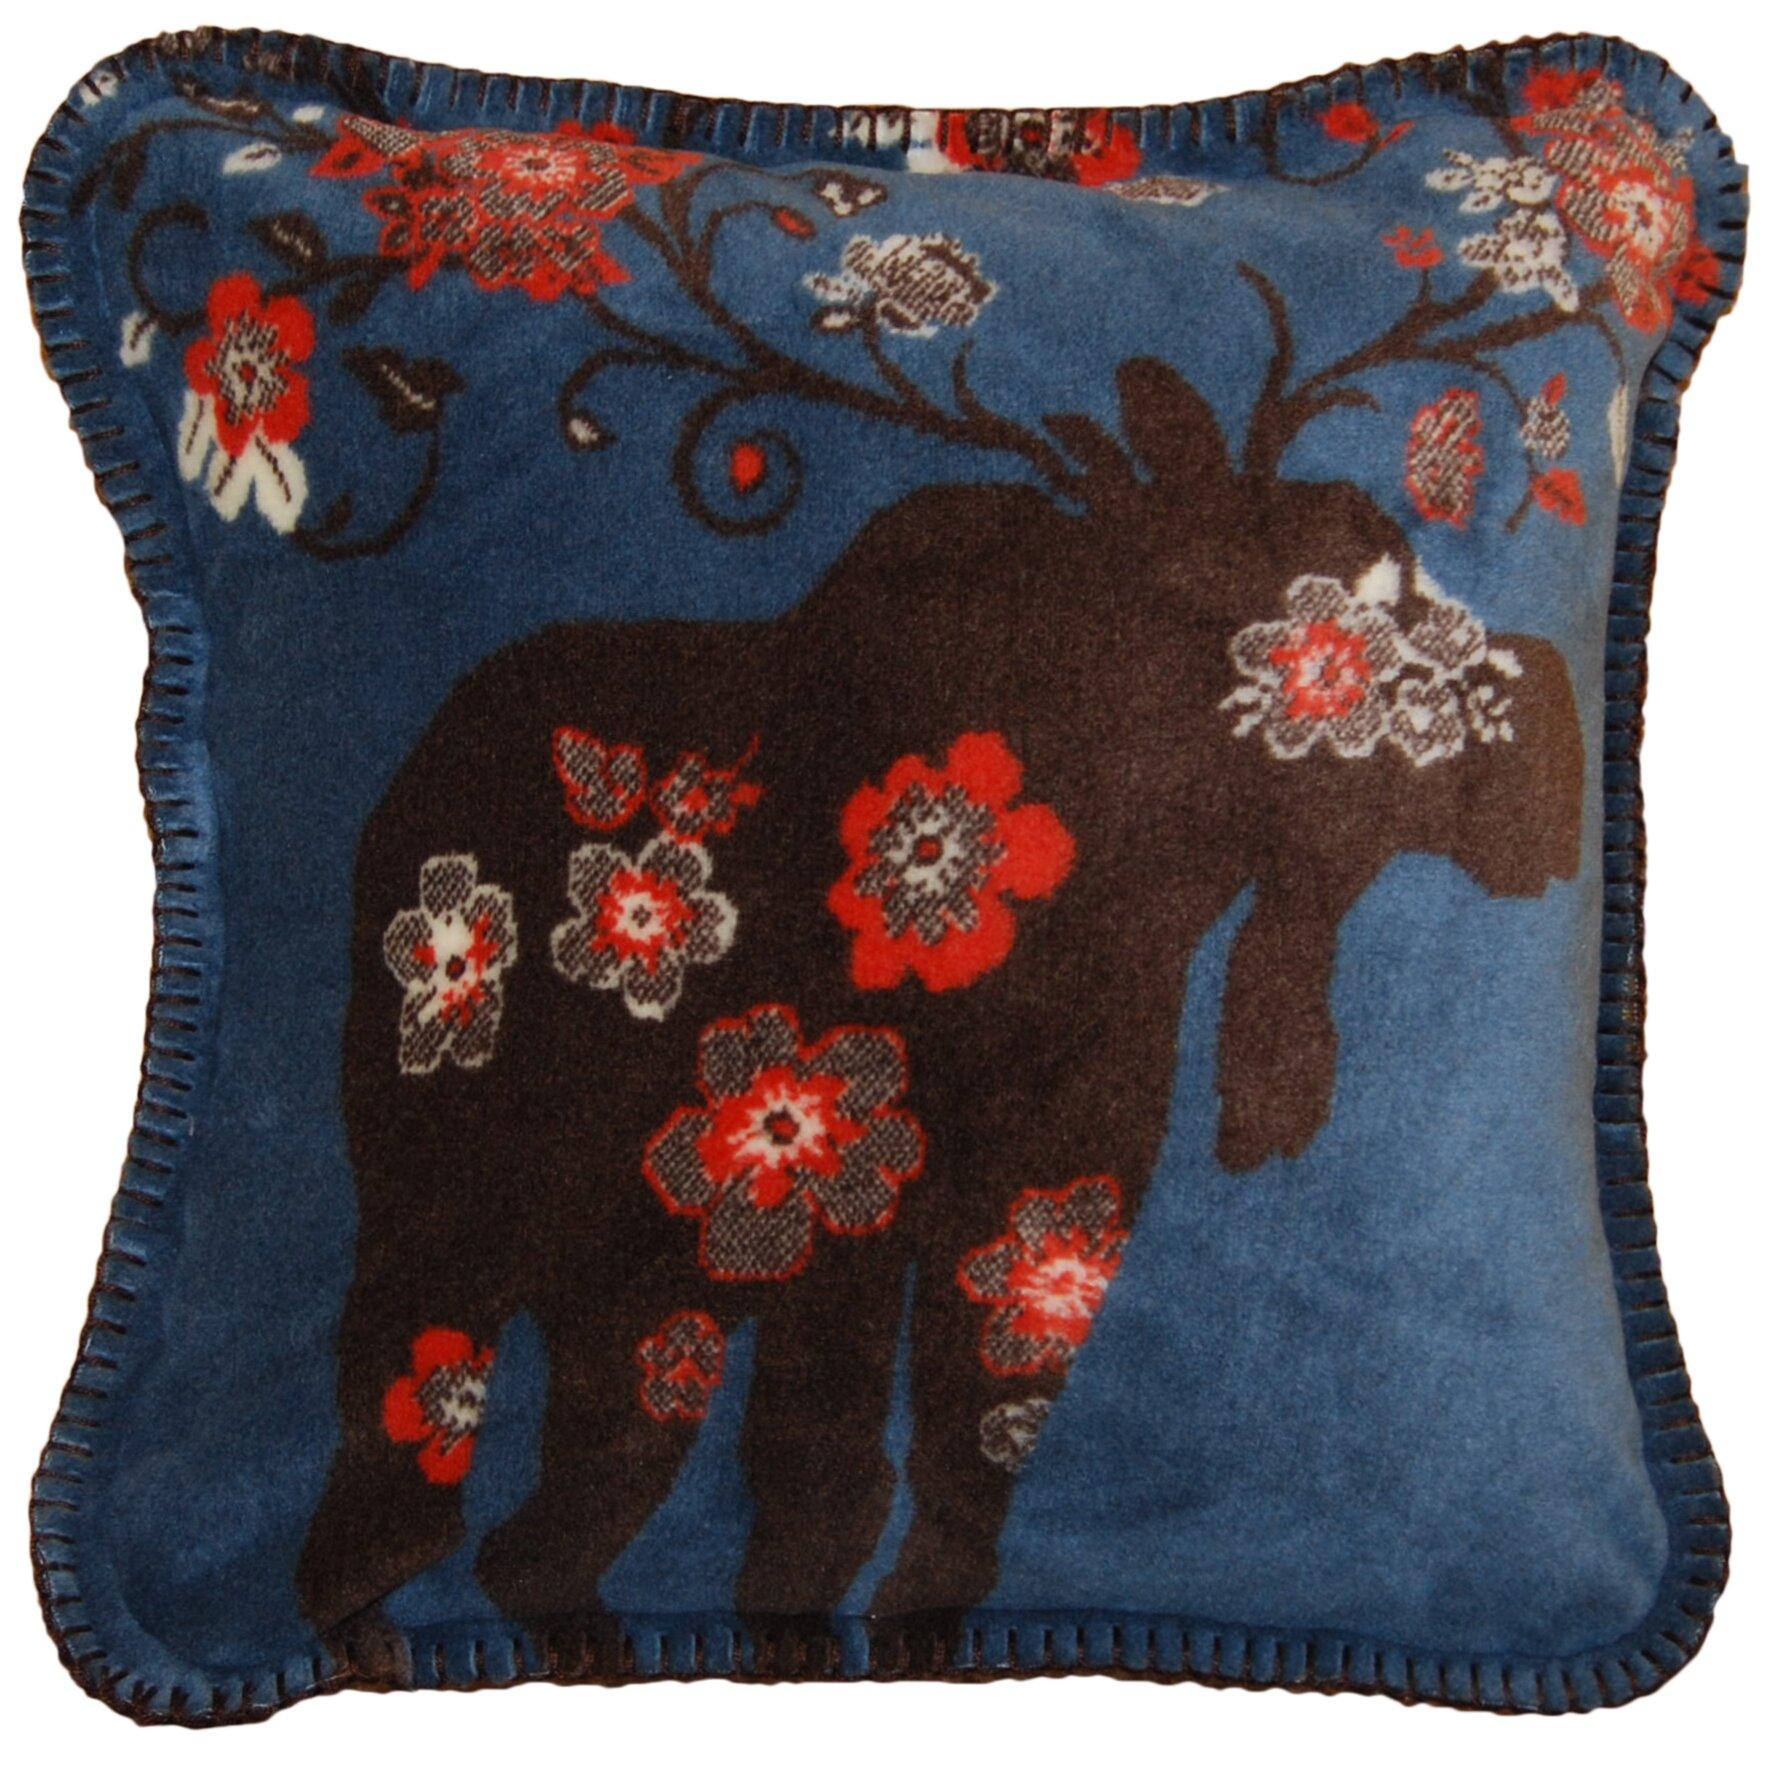 Kohls Moose Throw Pillow : Denali Moose Blossom Throw Pillow Wayfair